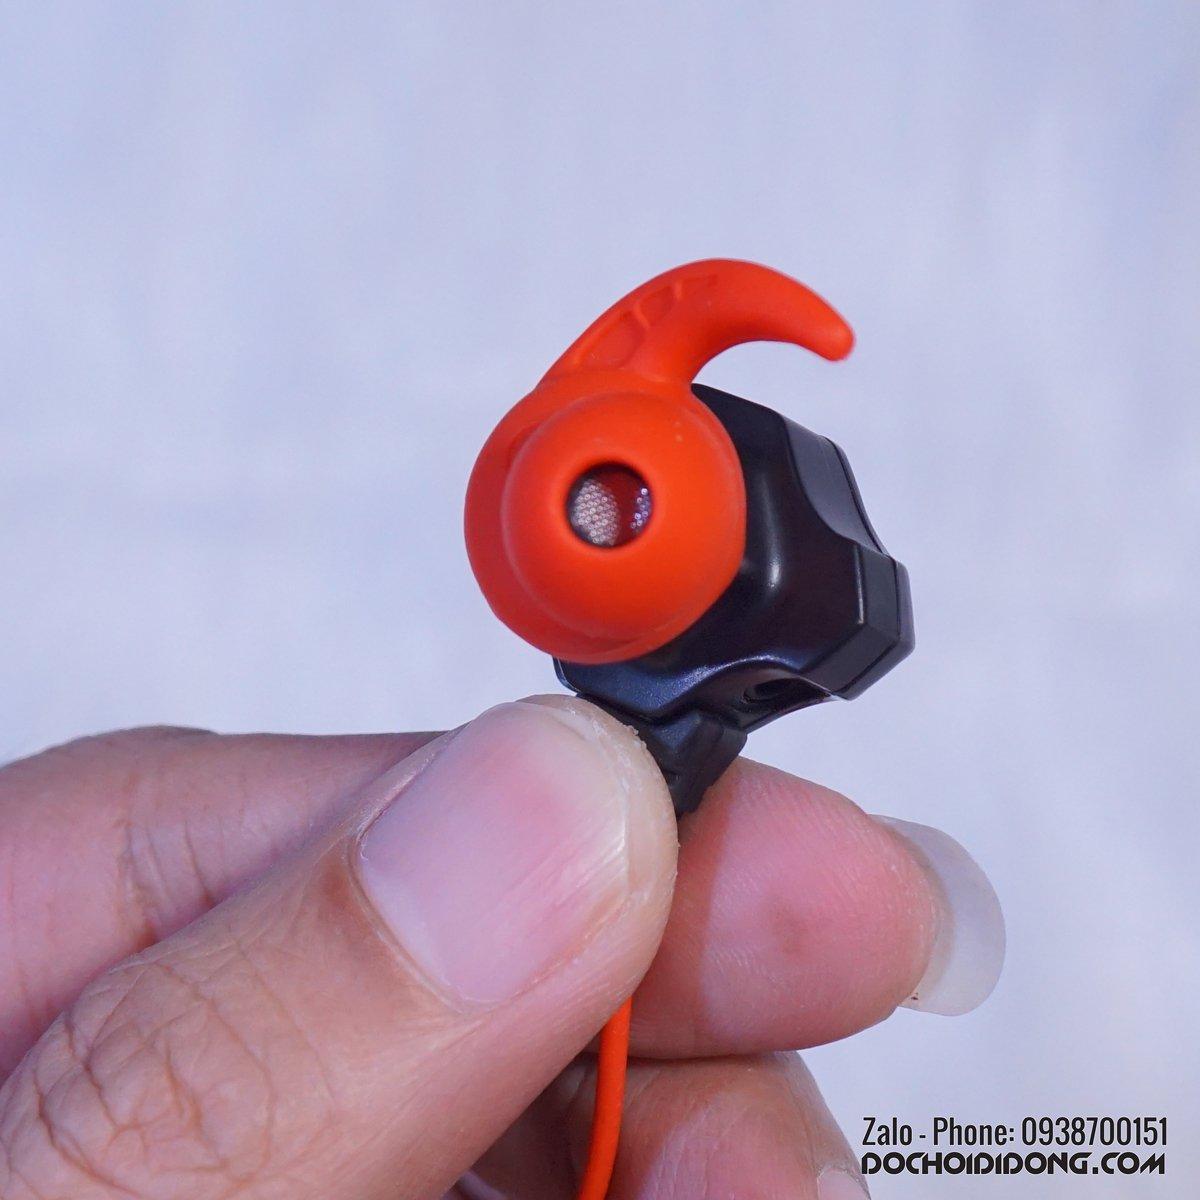 tai-nghe-game-thu-sendem-s2-mic-roi